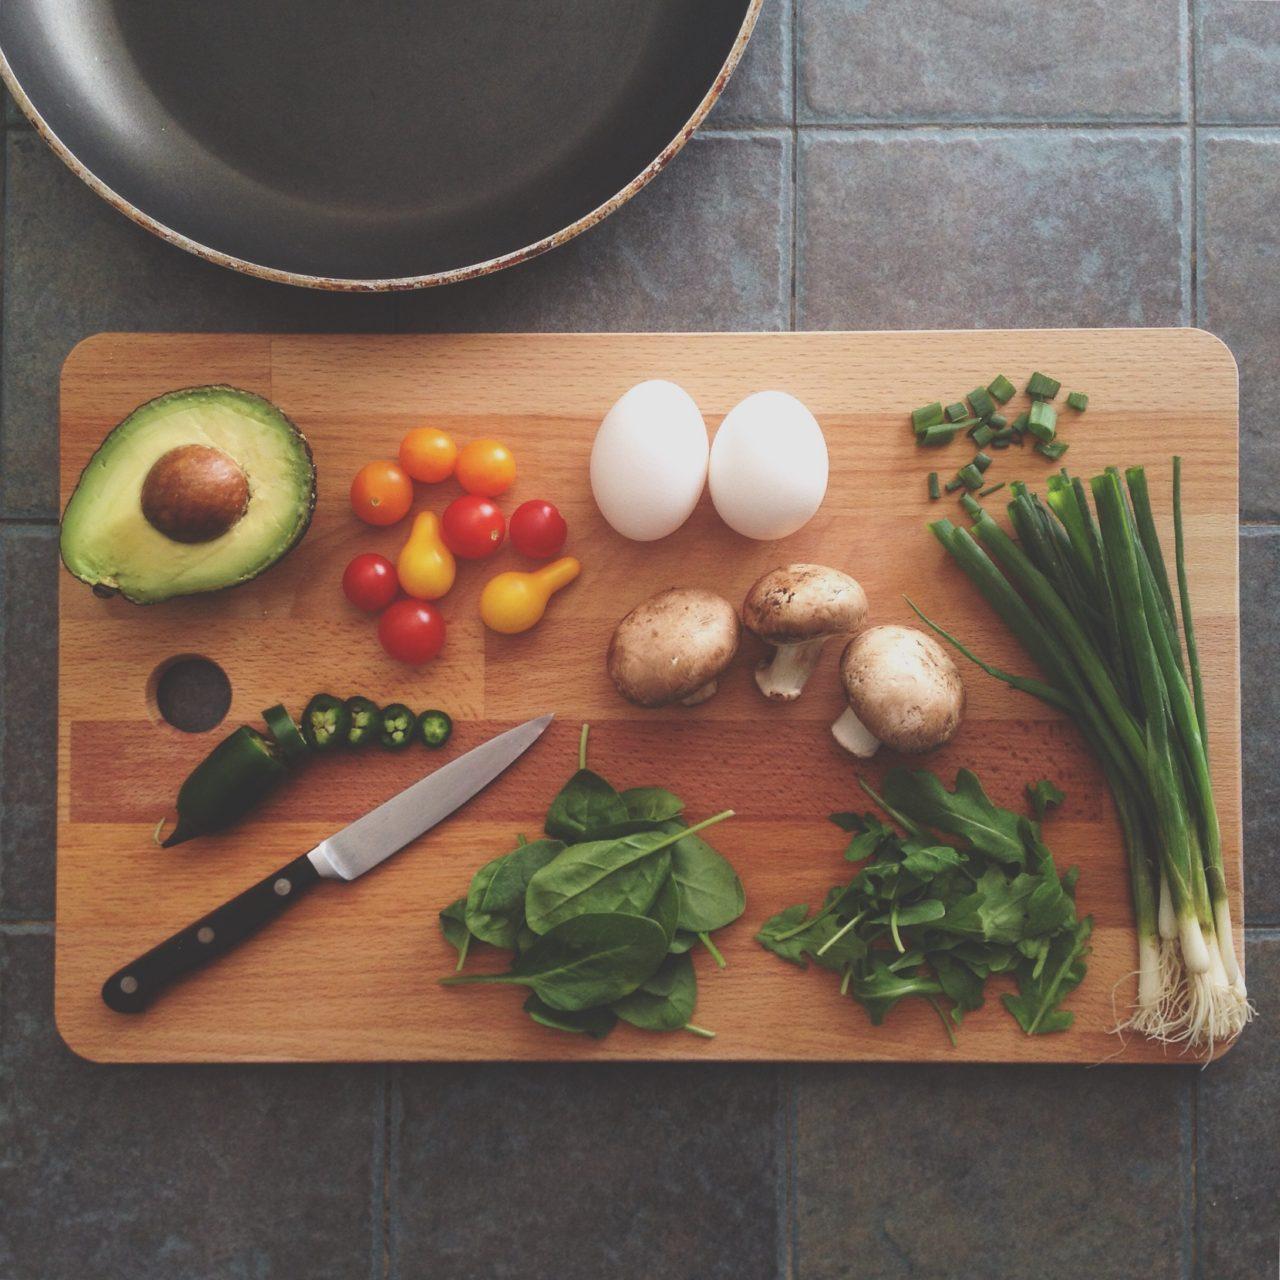 https://www.elevatehwc.com/wp-content/uploads/2018/09/food-on-a-cutting-board-1280x1280.jpg